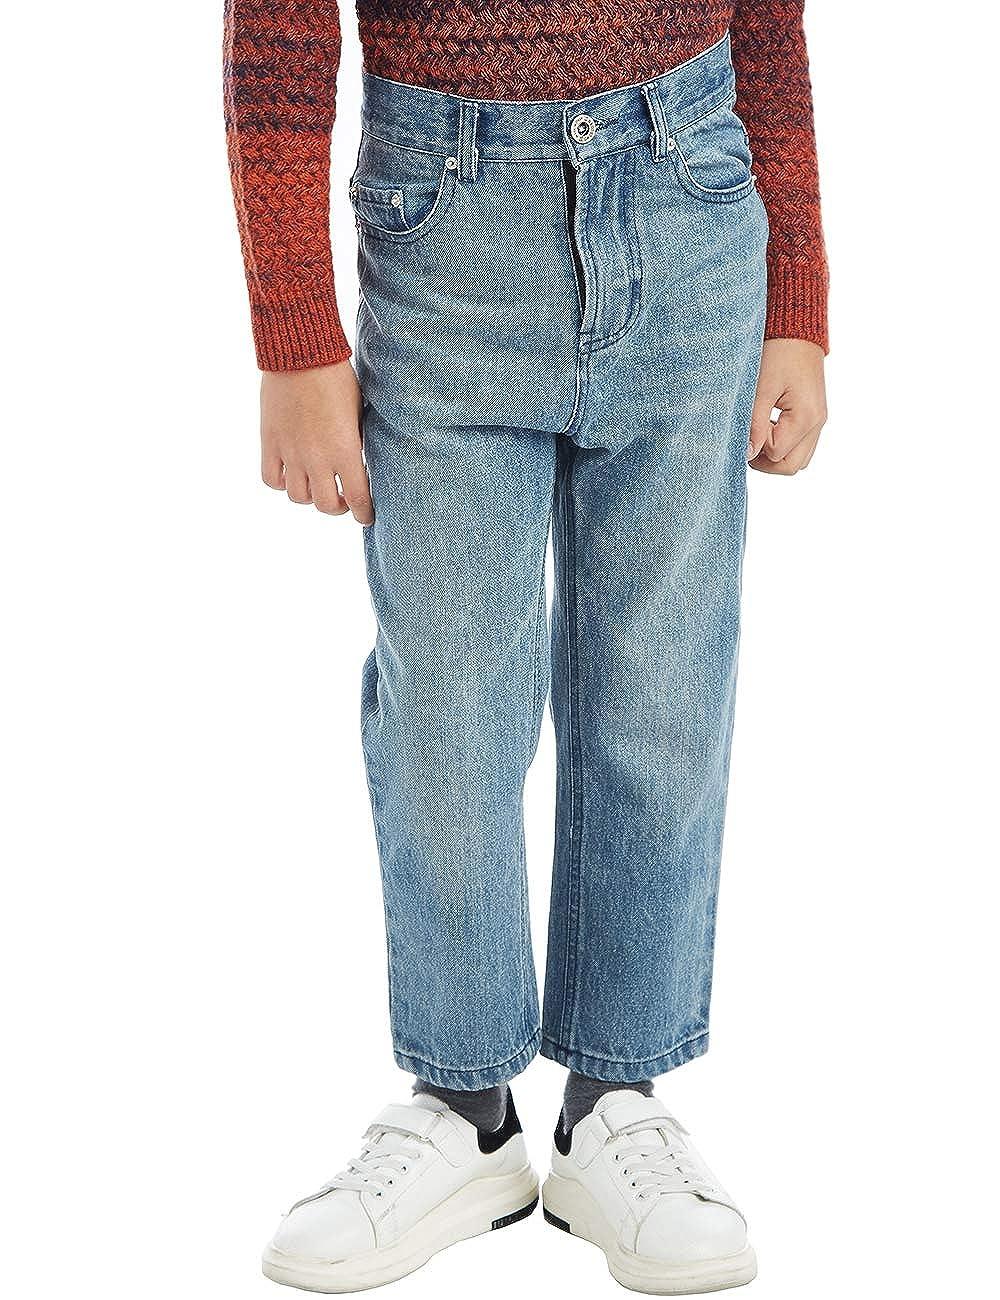 BYCR Boys' Blue Denim Jean Elastic Waist Pants for Kids Size 4-18 No. 71500092